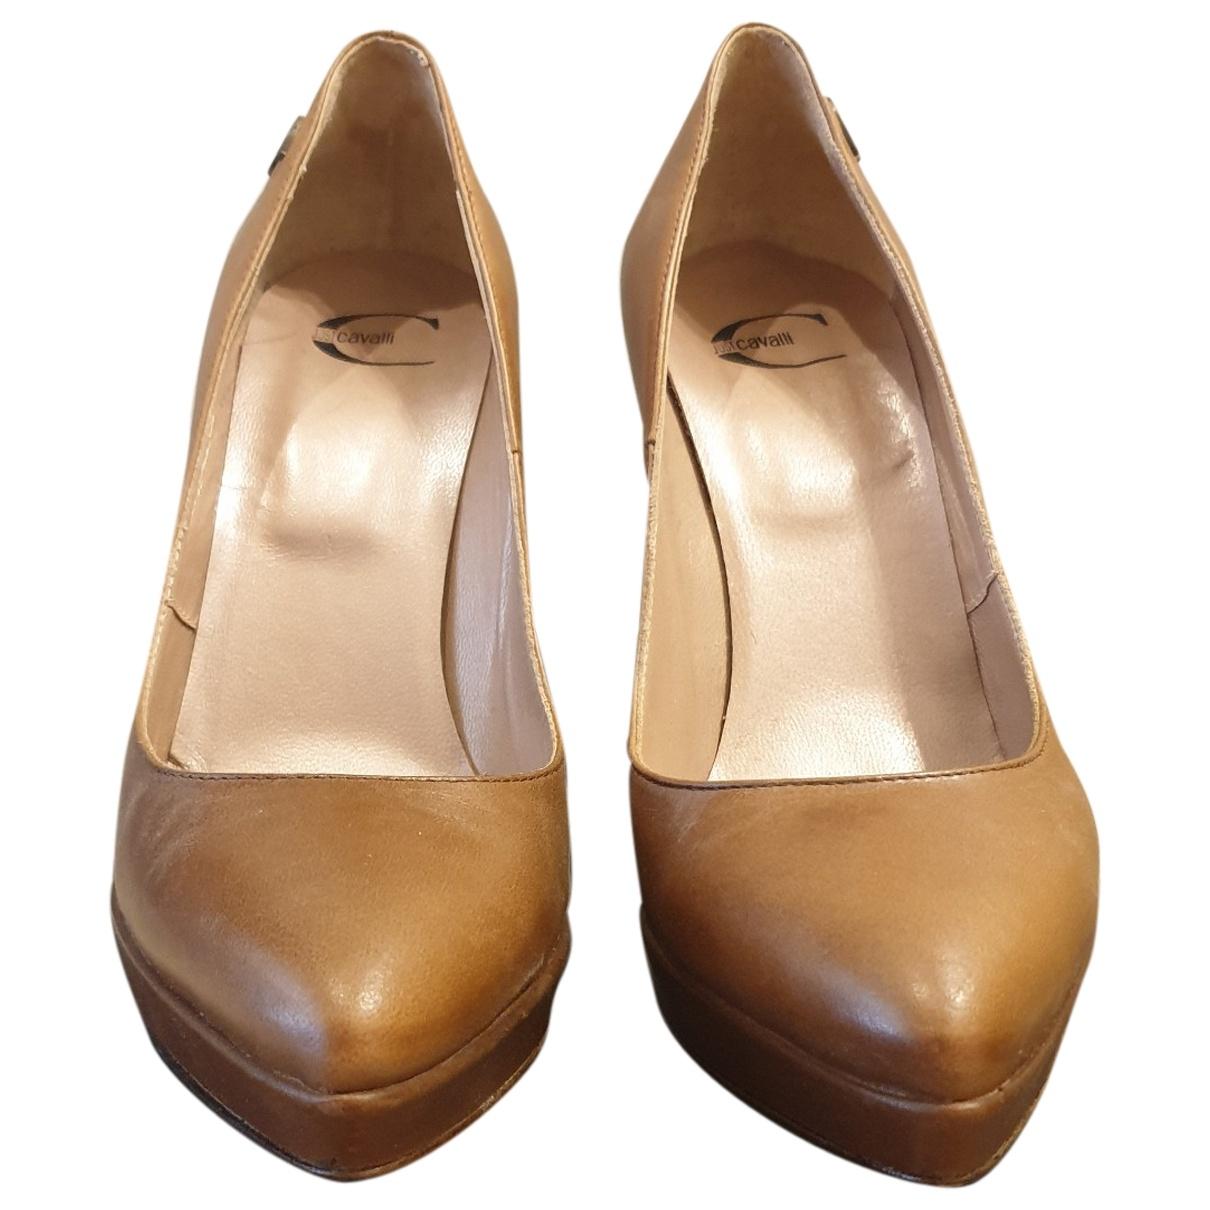 Just Cavalli \N Camel Leather Heels for Women 40 EU